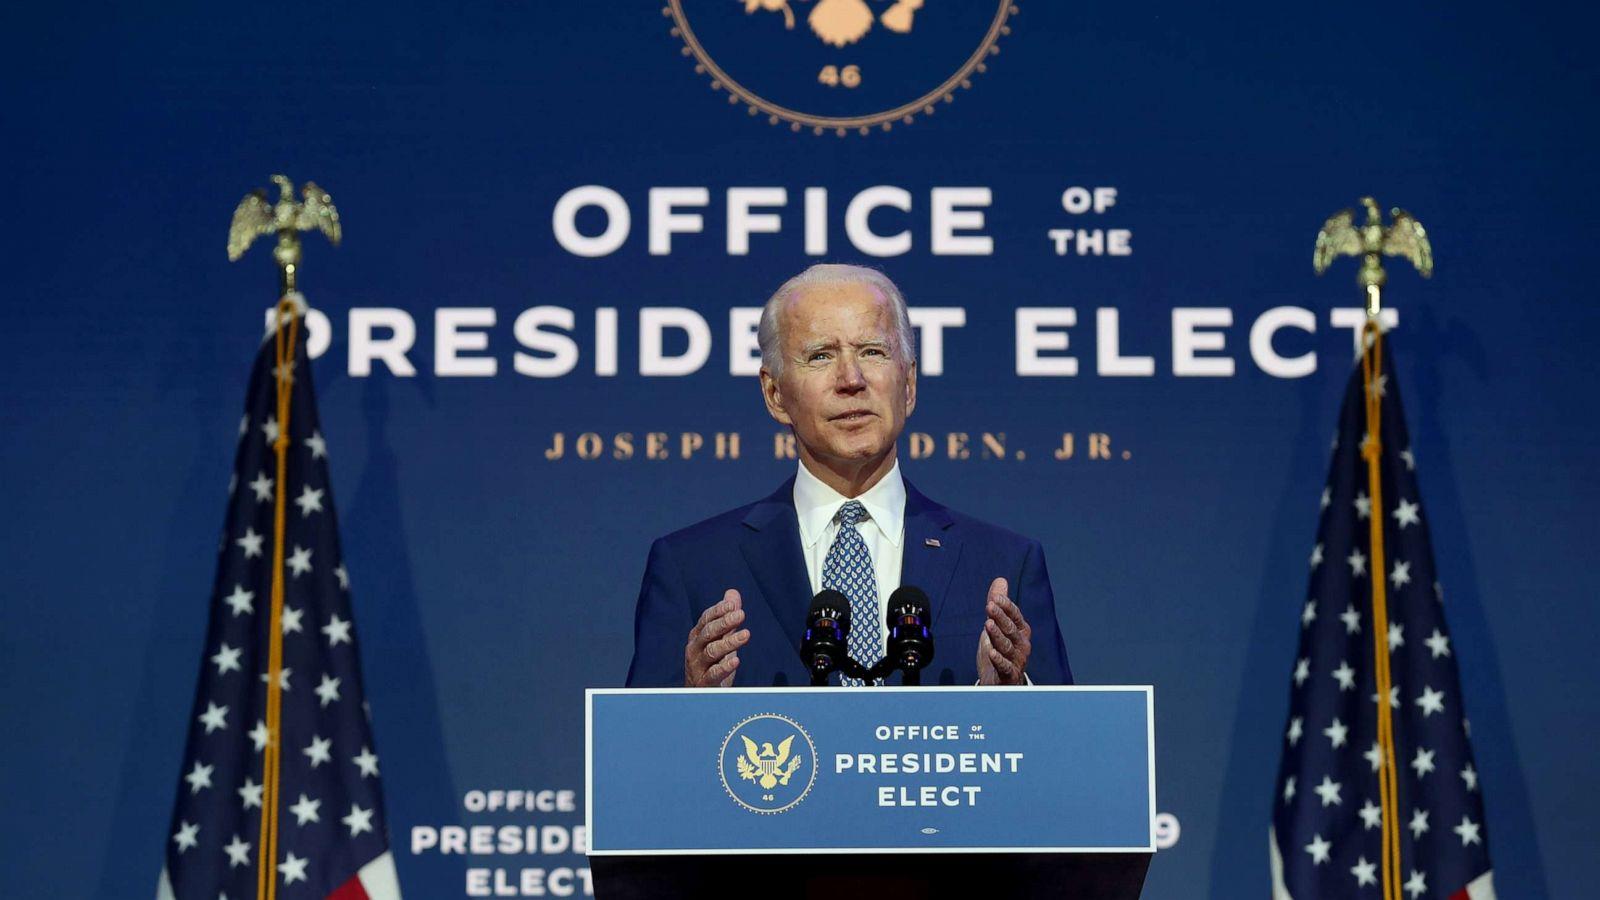 Election 2020 updates: Biden warns of 'dark winter,' pushes masks in pandemic plan